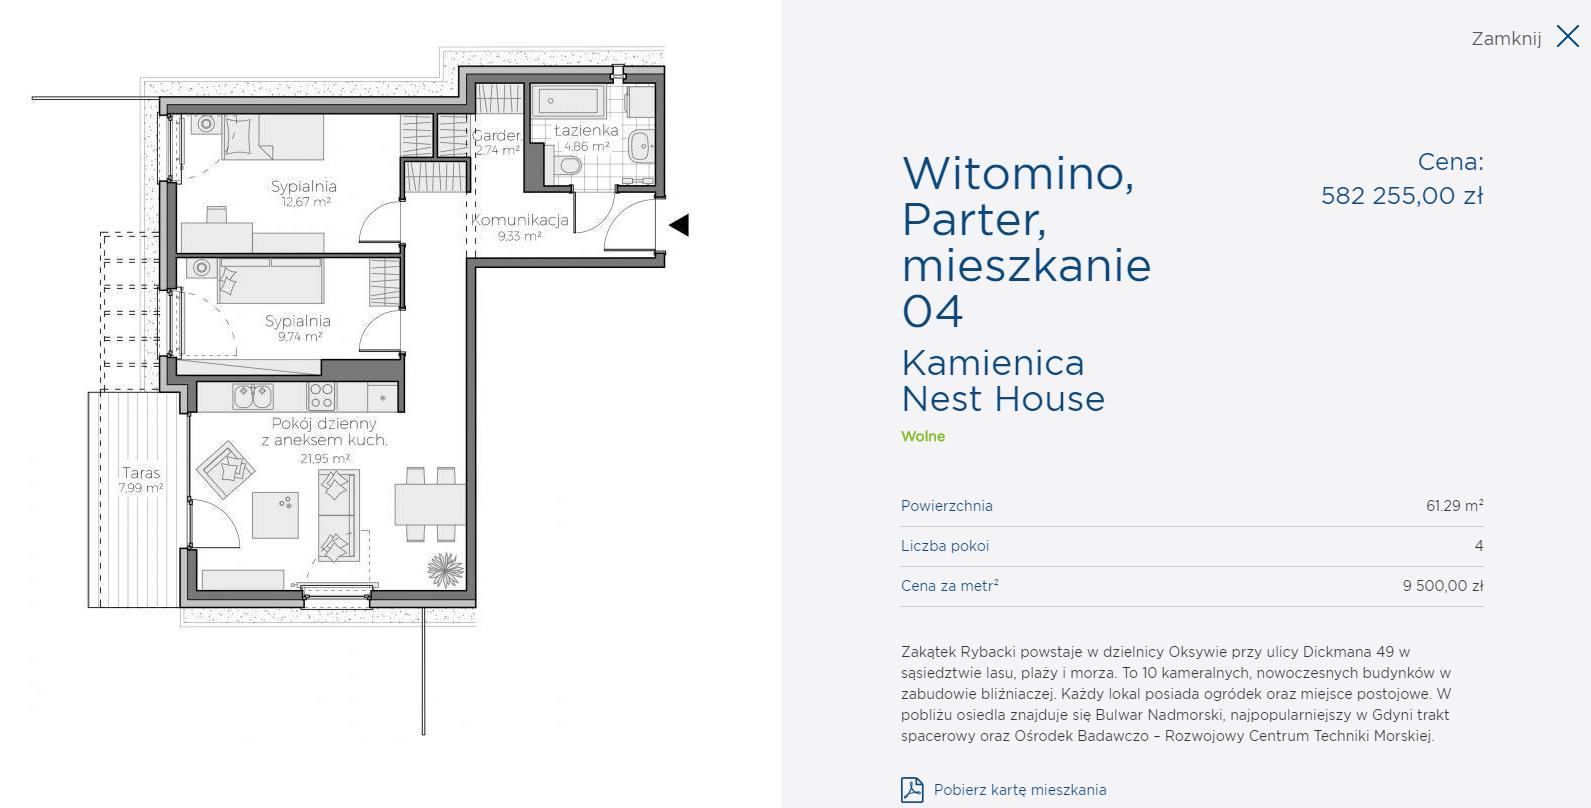 FireShot Capture 503 - Kamienica Nest House - http___nest-house.pl_pl_kamienica-nest-house